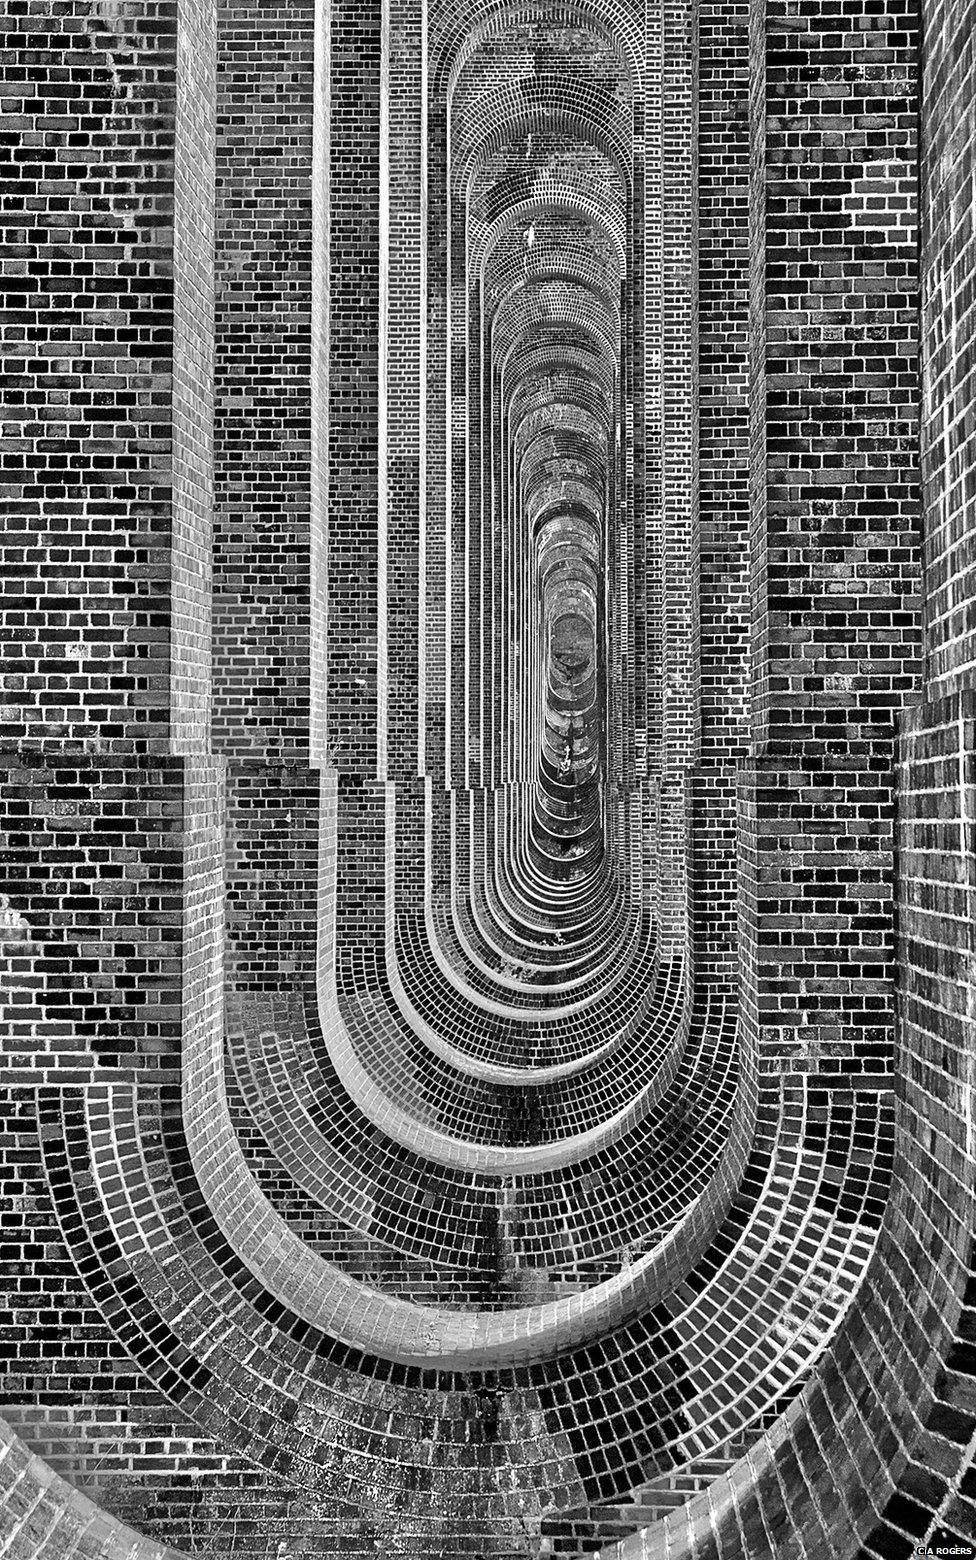 Brick viaduct